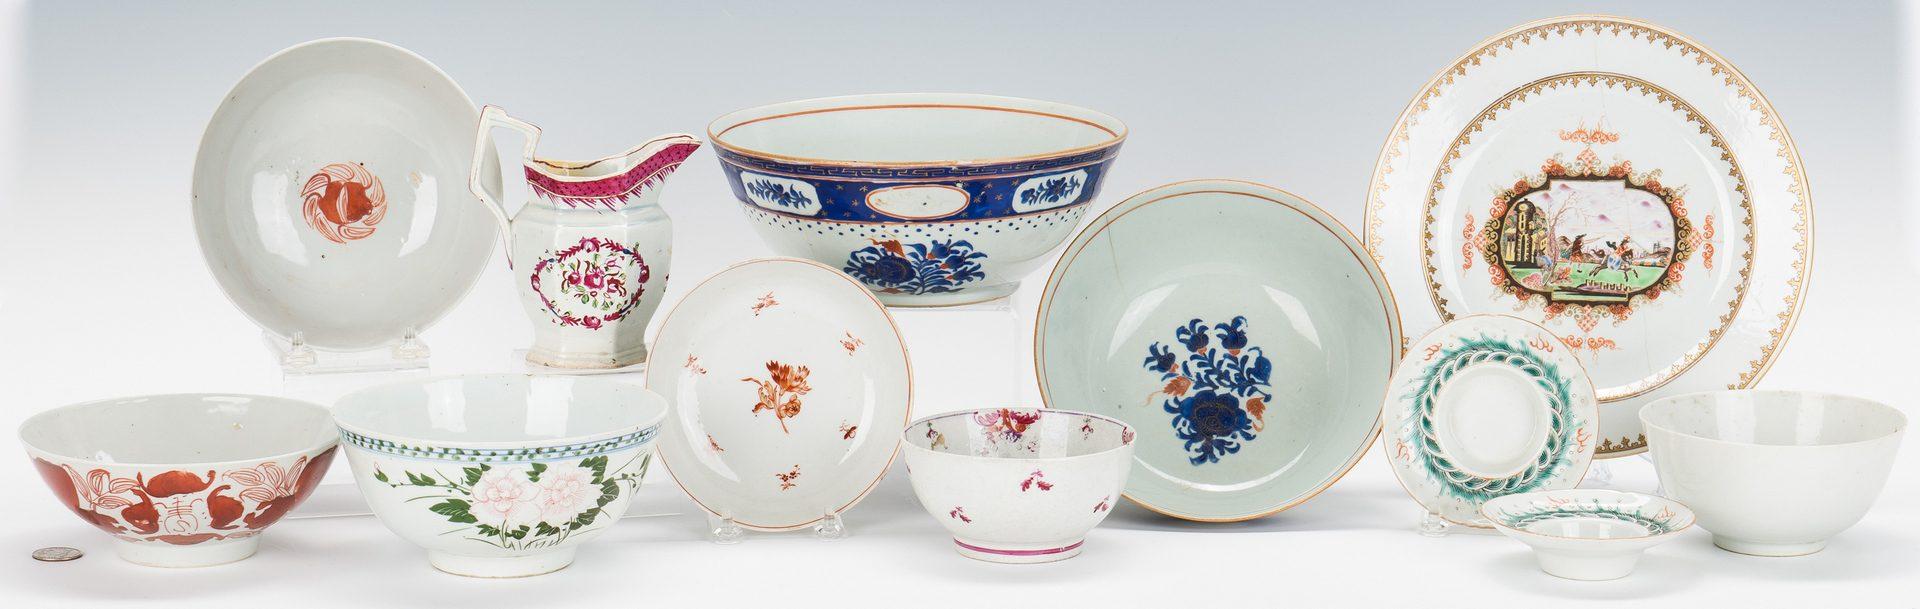 Lot 316: 12 pcs Chinese Export porcelain inc. battle scene